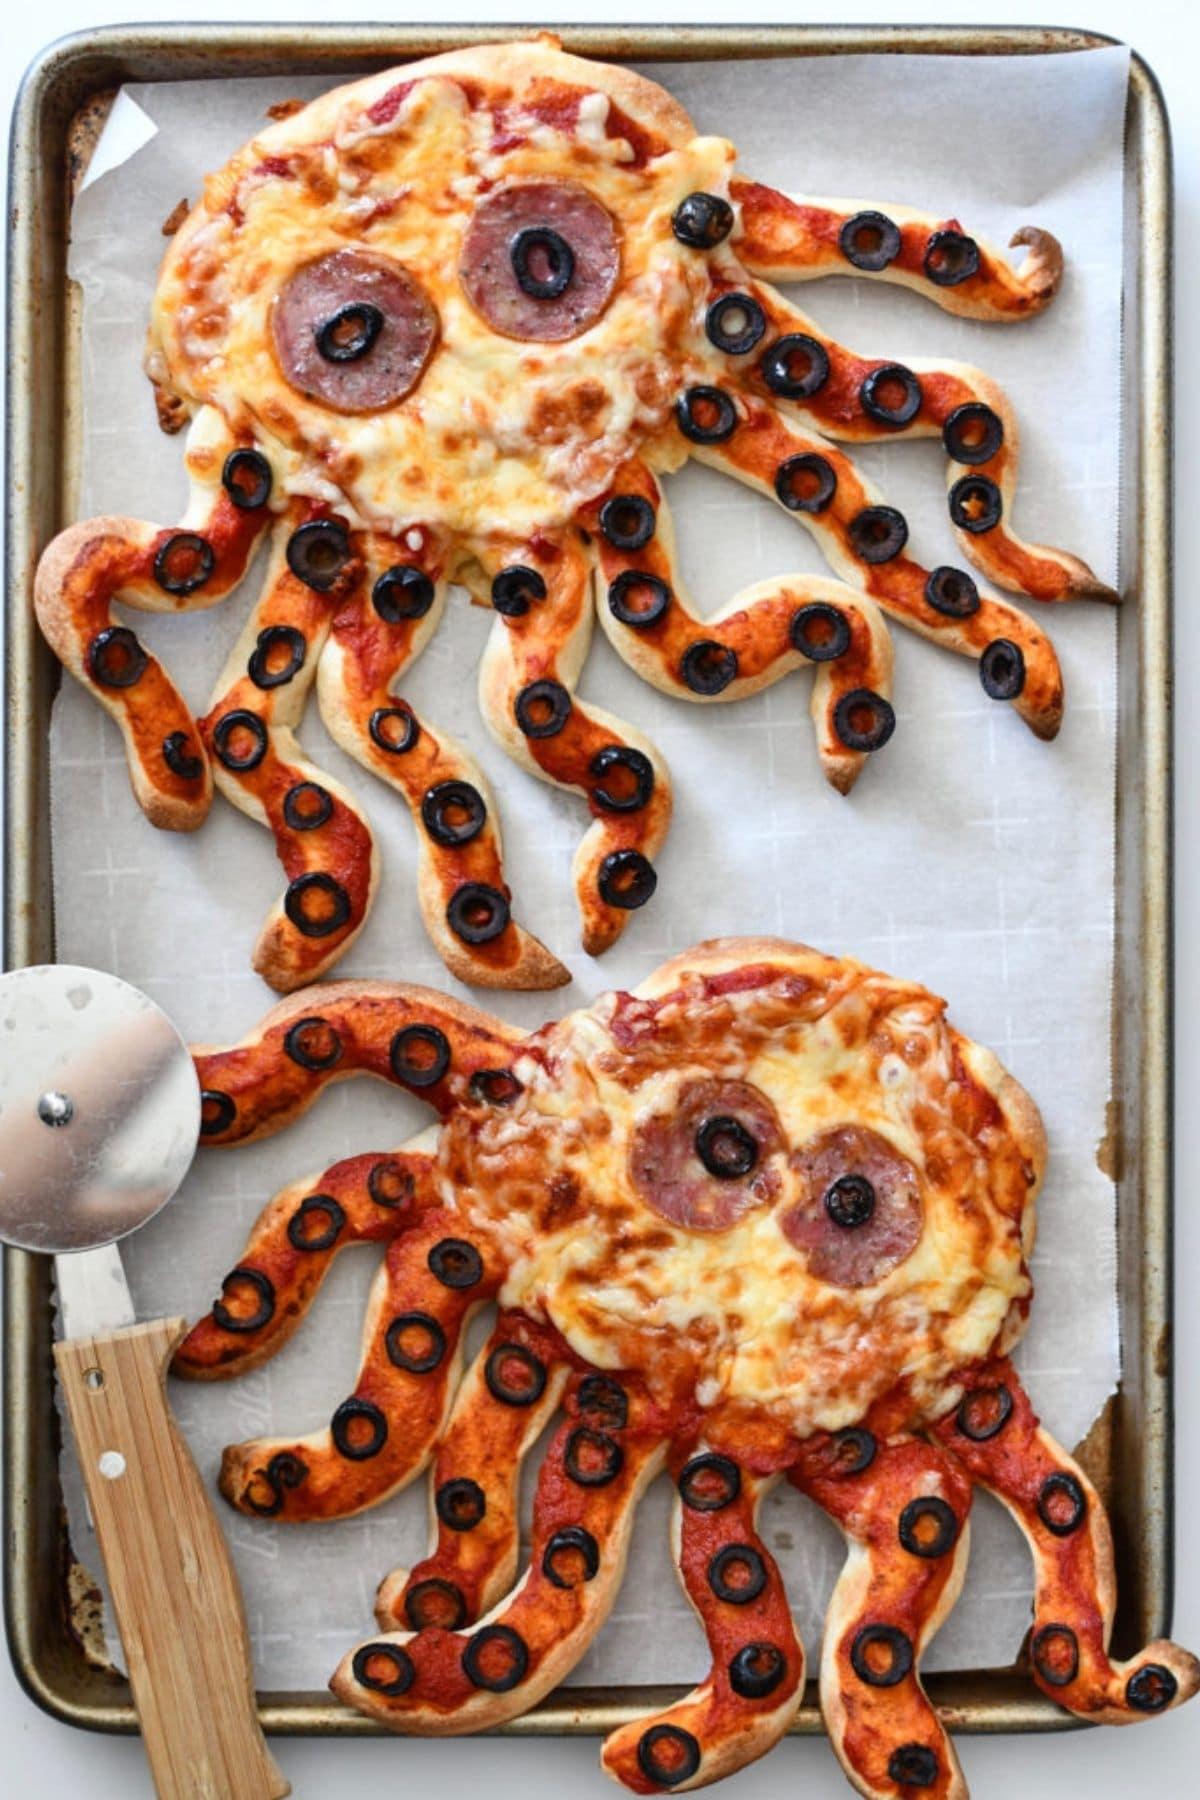 Octopus shaped pizzas on baking sheet